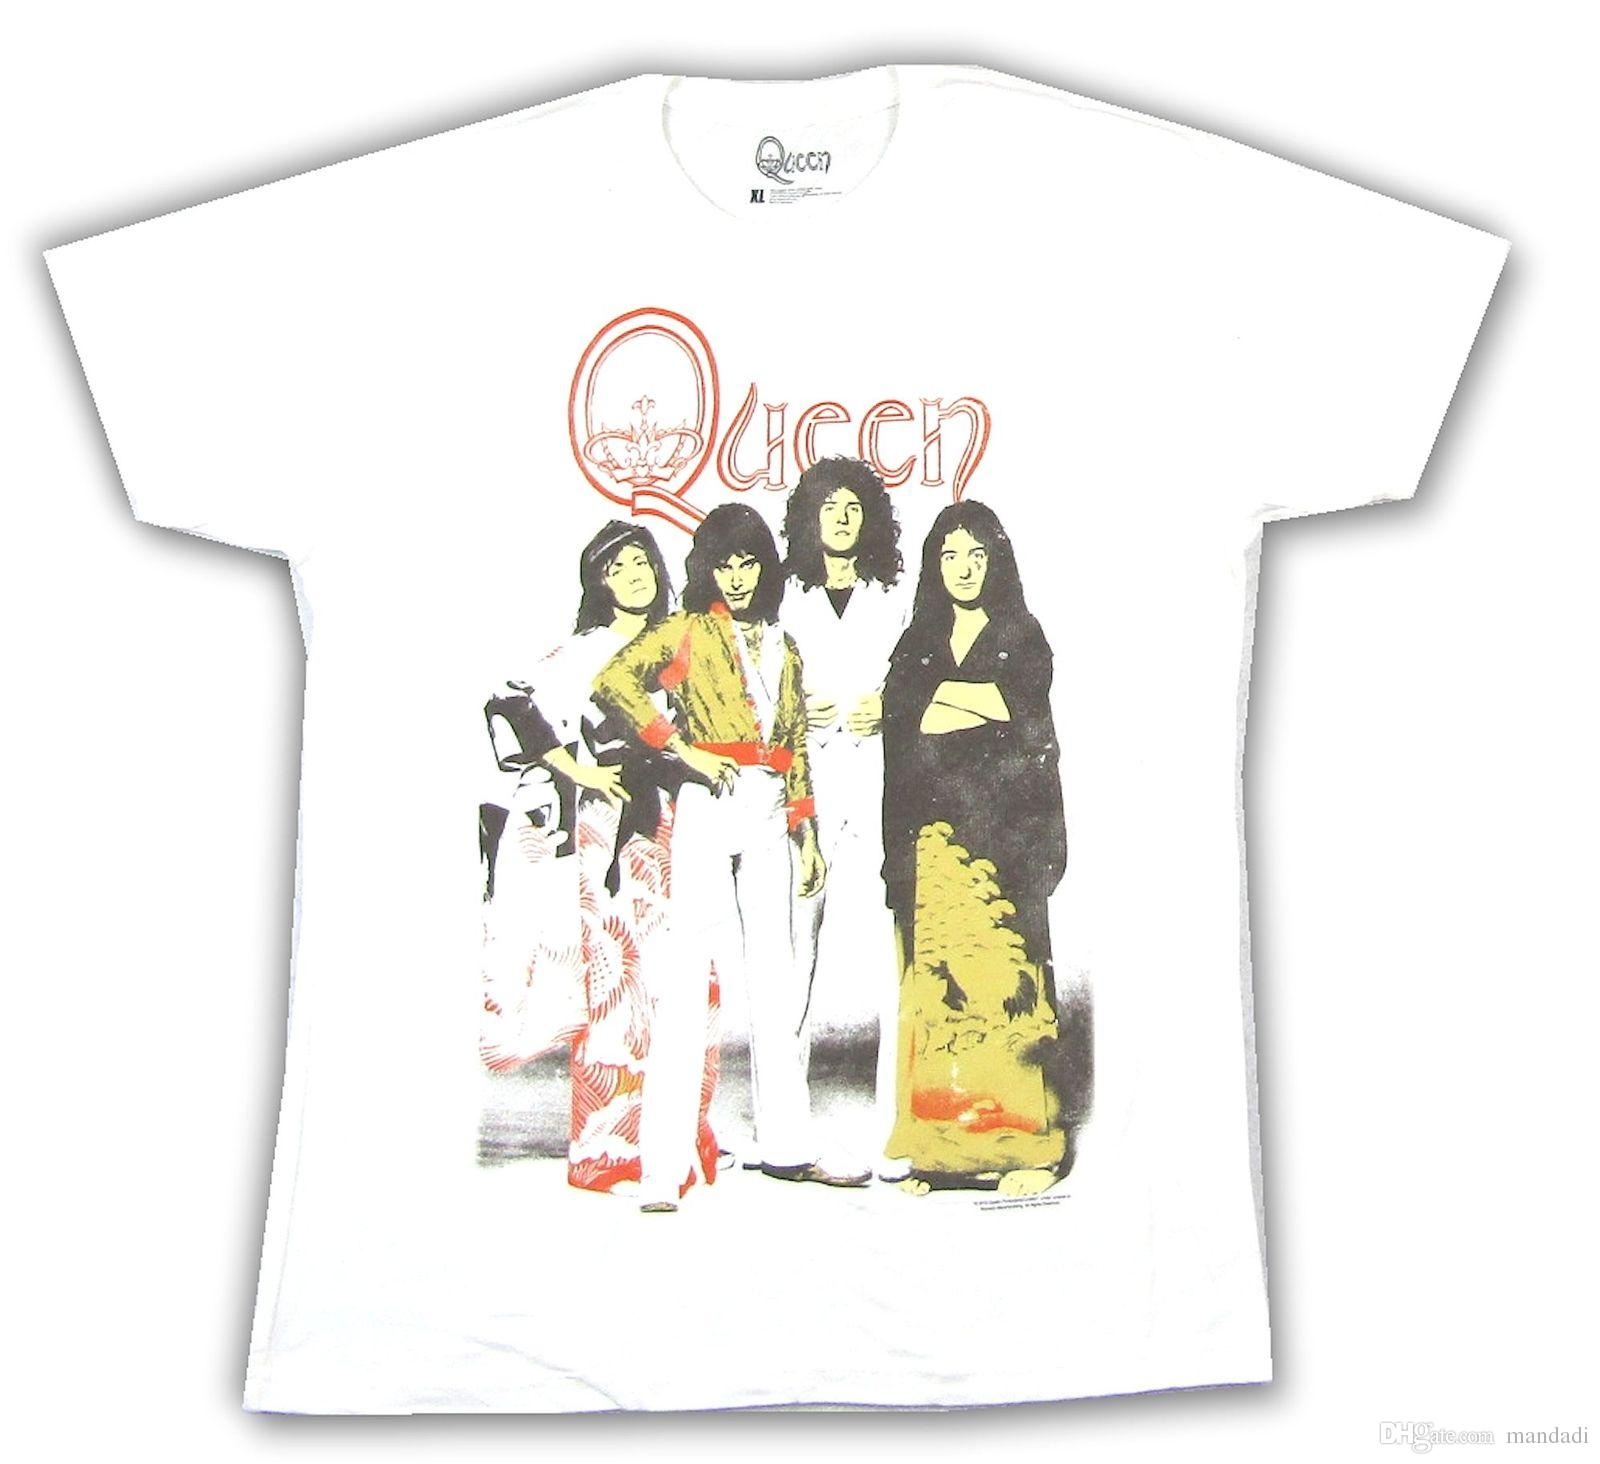 70ae61ef6 Nasa T Shirt Amazon Uk | Kuenzi Turf & Nursery